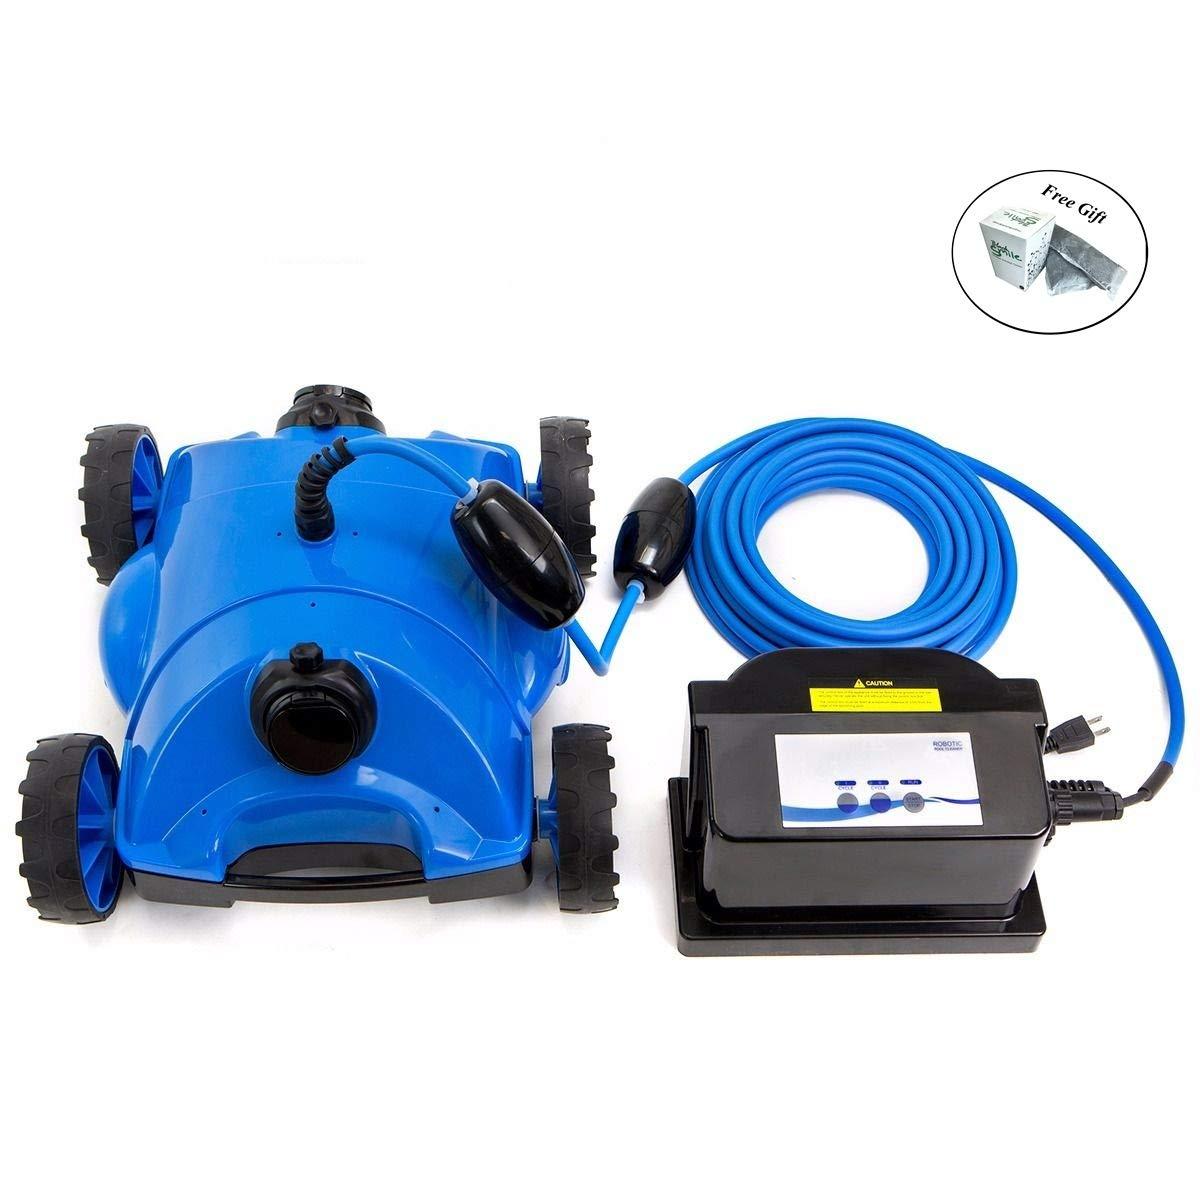 Amazon.com: Agua Bots superior/en el piso piscina Rover ...